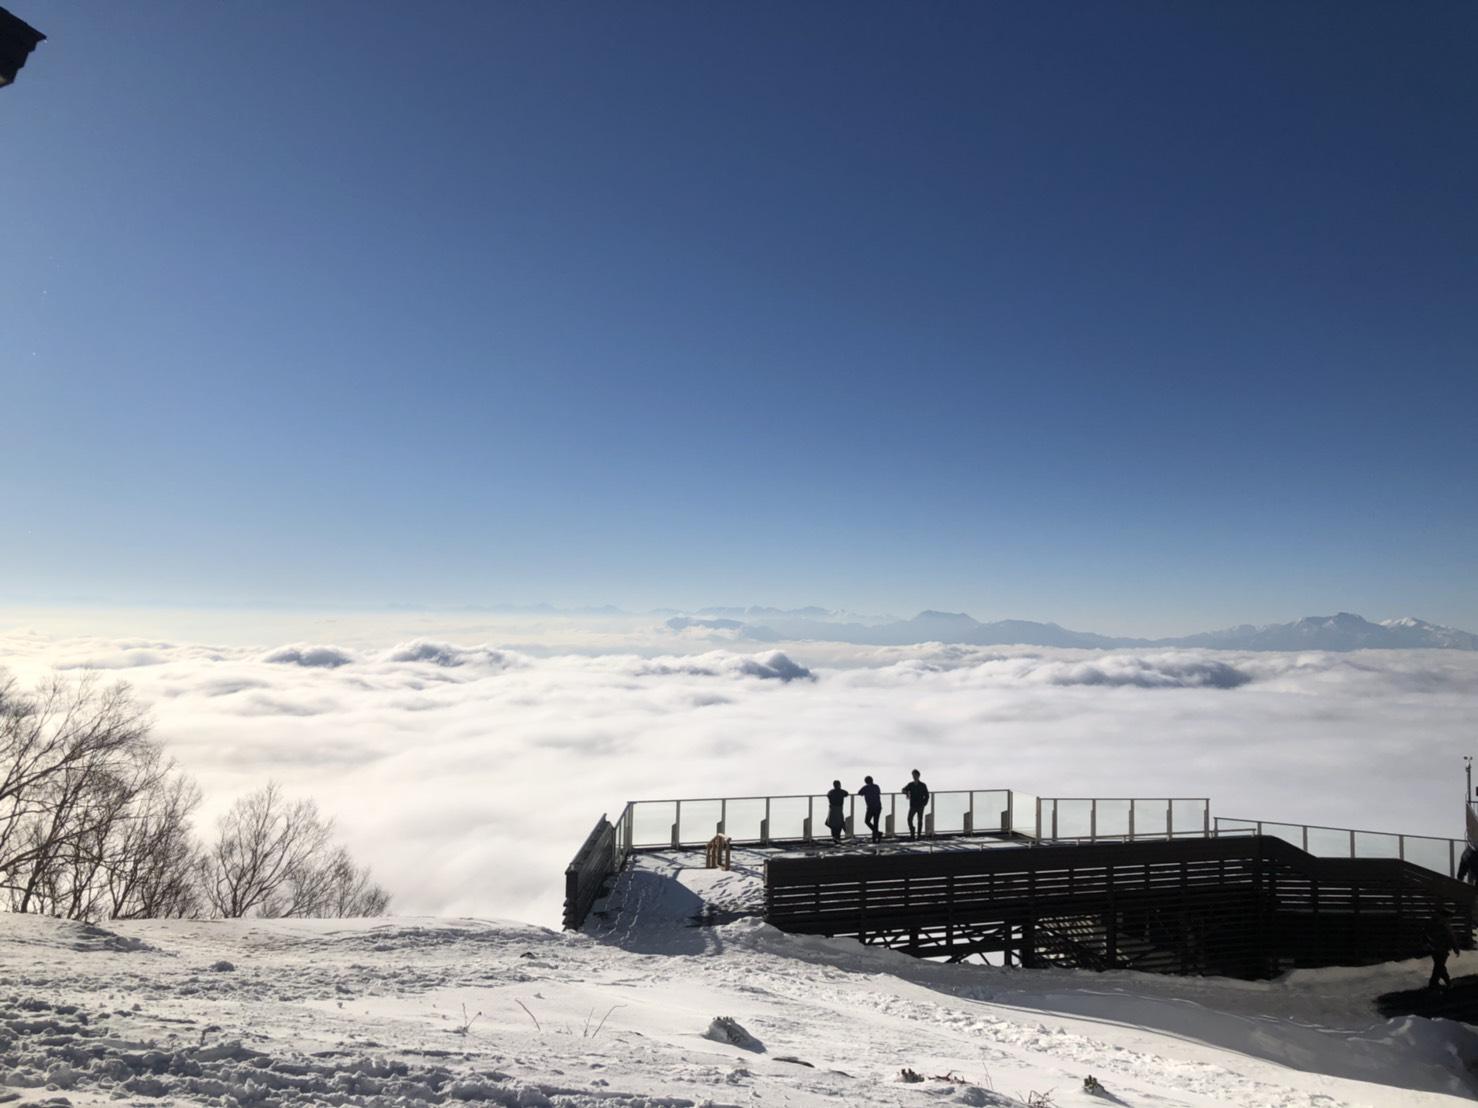 SORA terrace冬の観光プランSORA terrace冬の観光プランSORA terrace冬の観光プラン9:20便